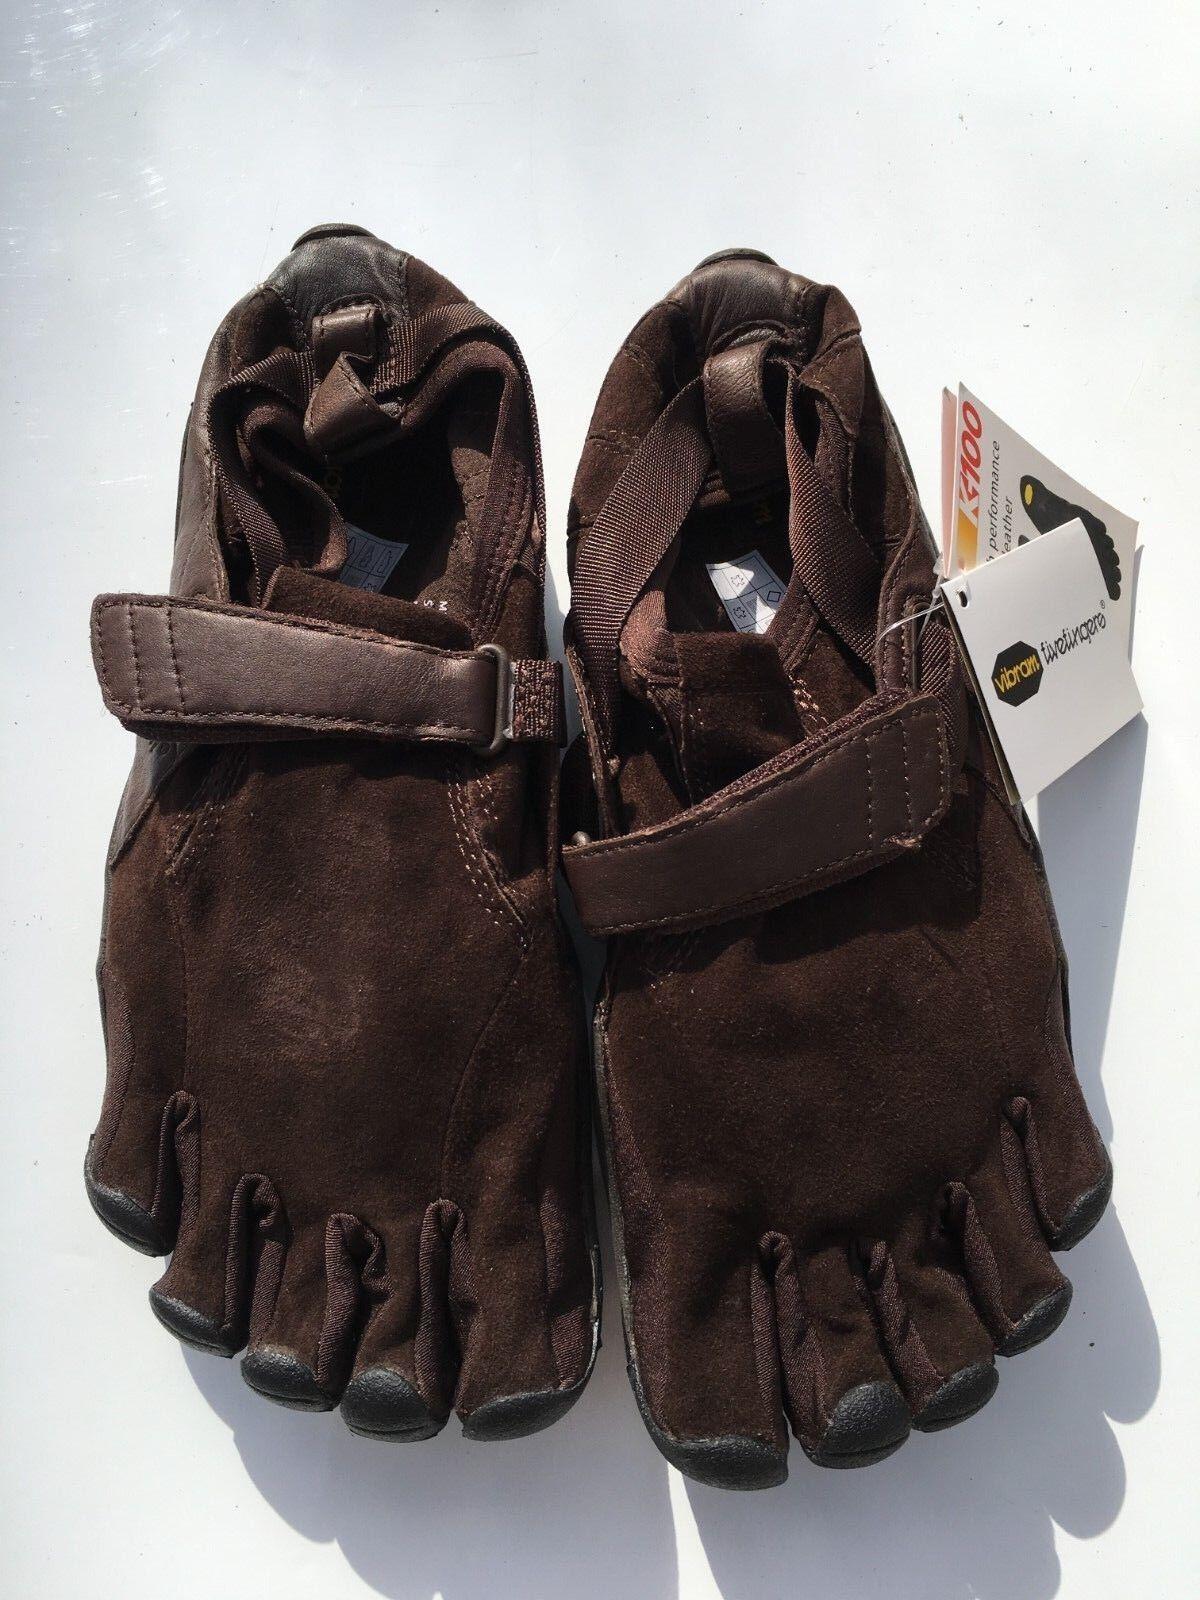 Vibram five fingers KSO trek K100 Leather Brown M241 size 42